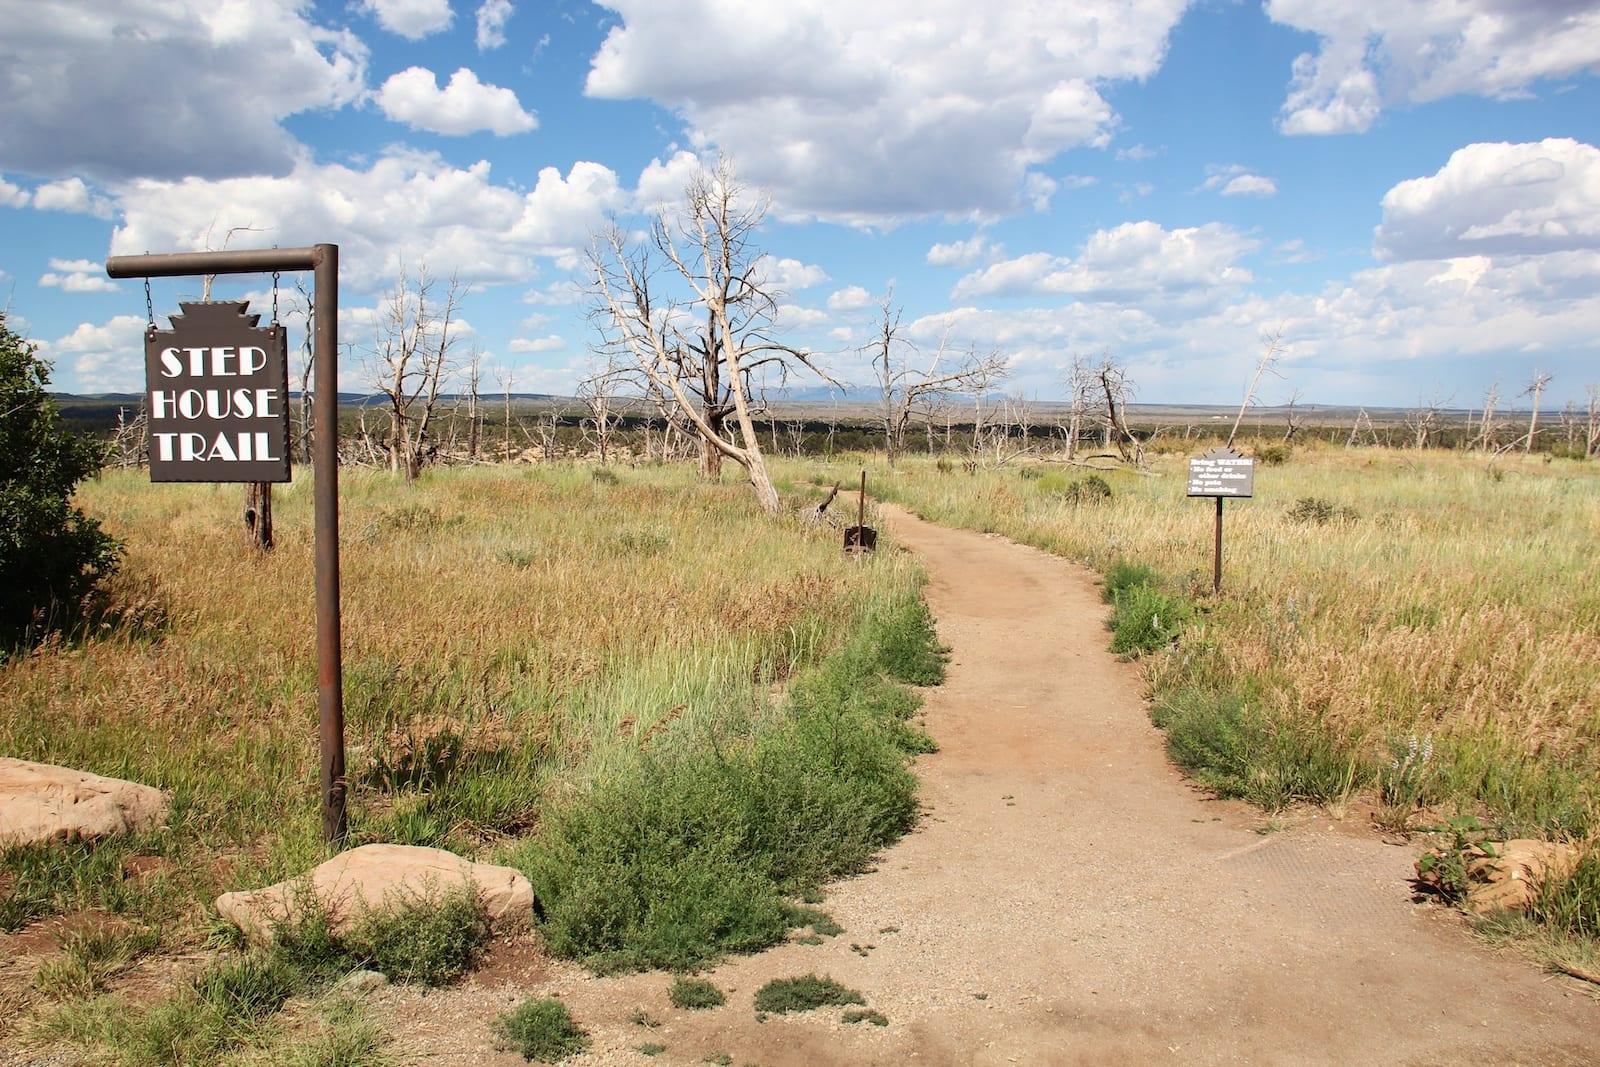 Step House Mesa Verde National Park Trailhead Colorado